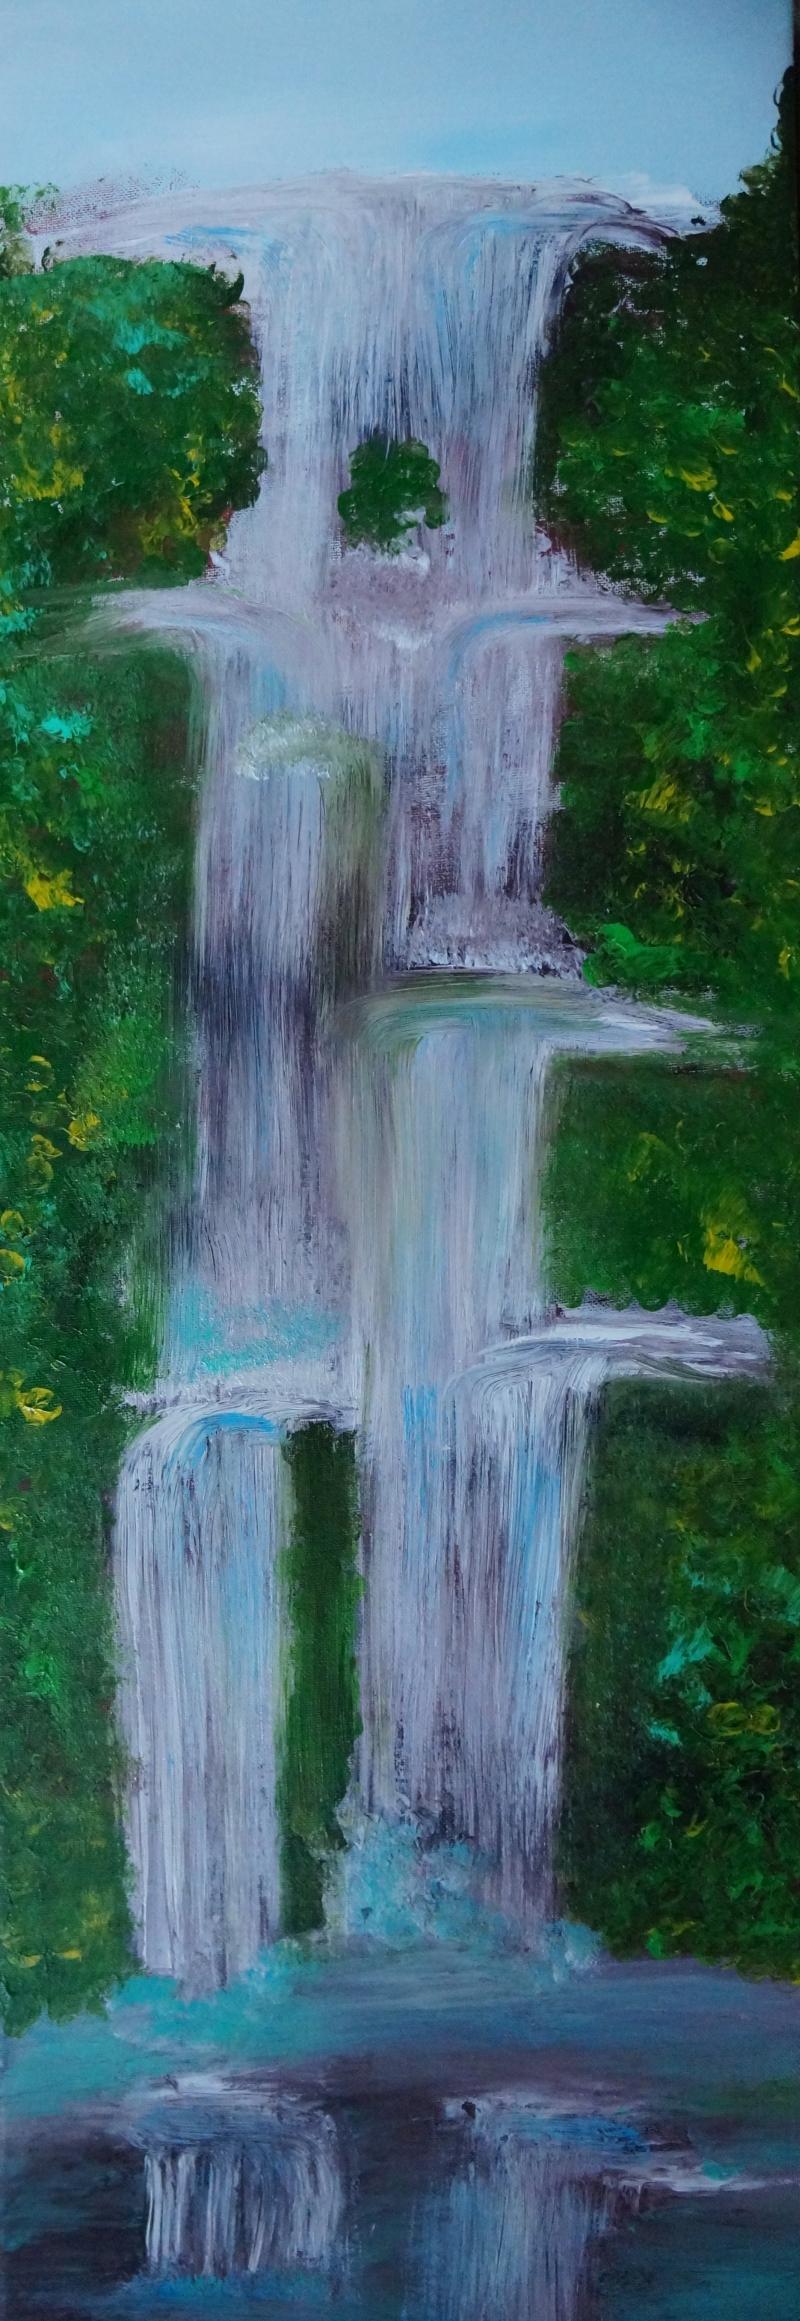 Wasserfall III,30x90cm, Acryl/Spachtelmasse auf Leinwand